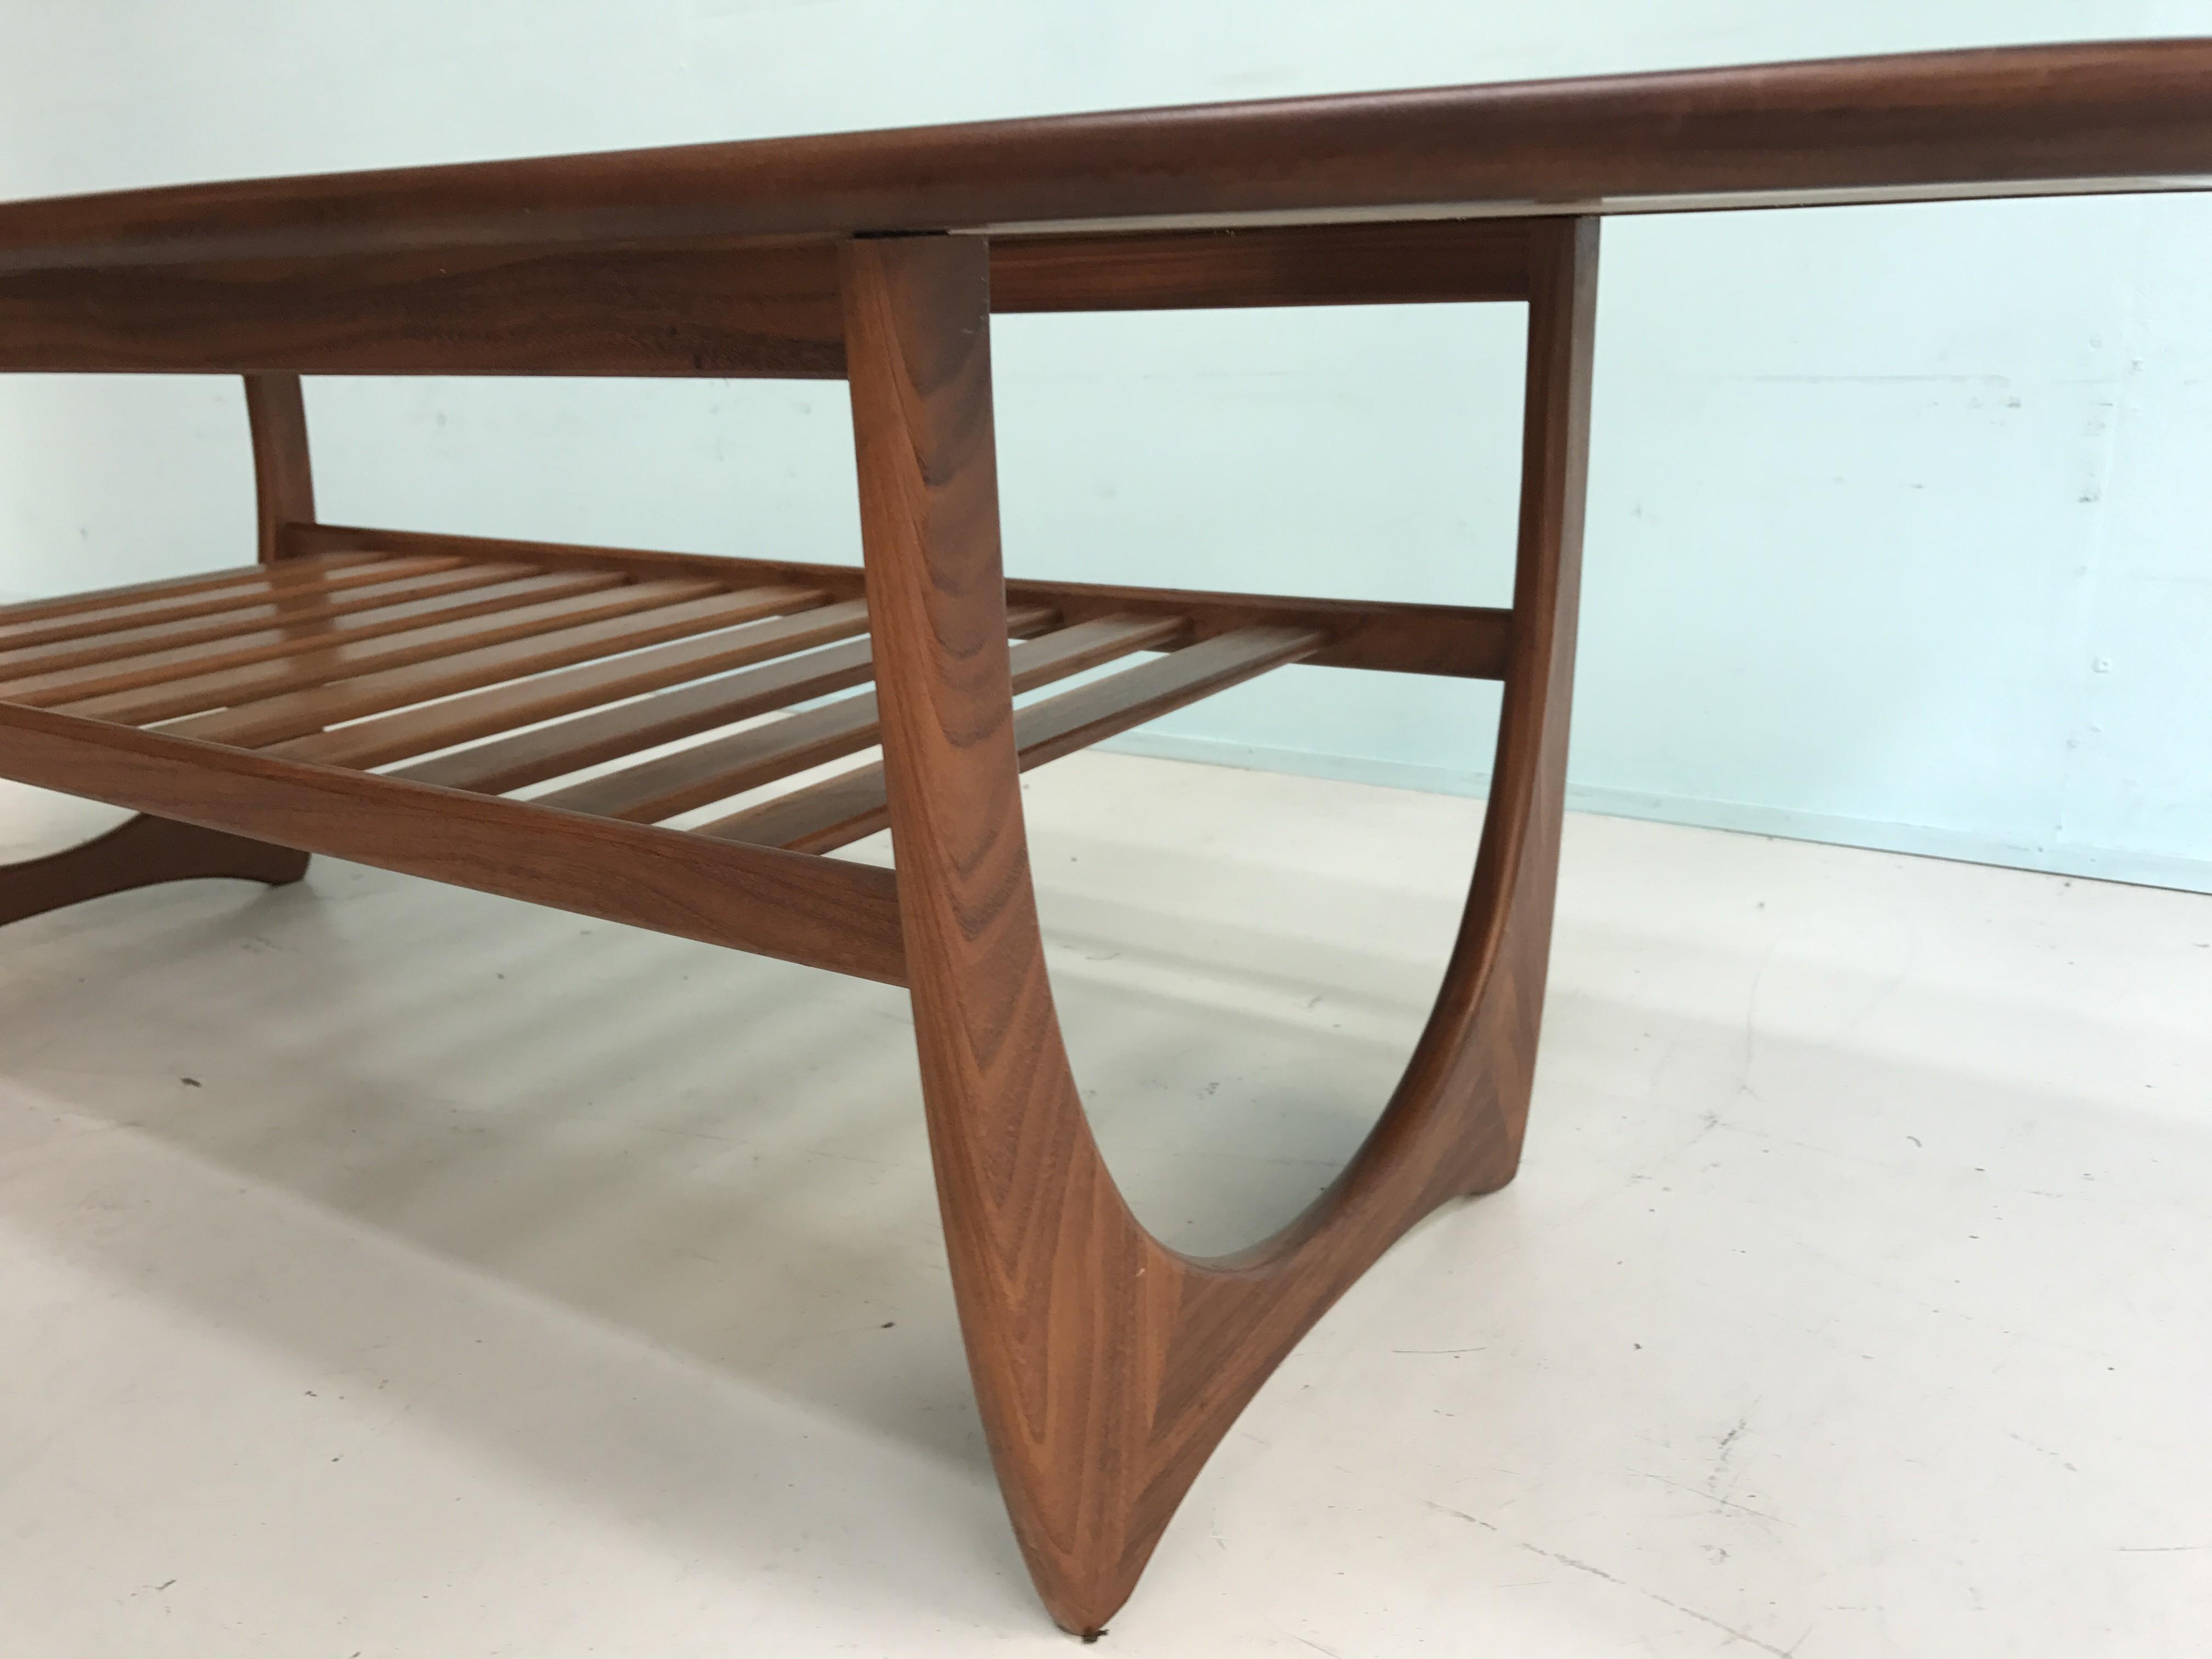 G-Plan glass coffee table - 1960s - Design Market